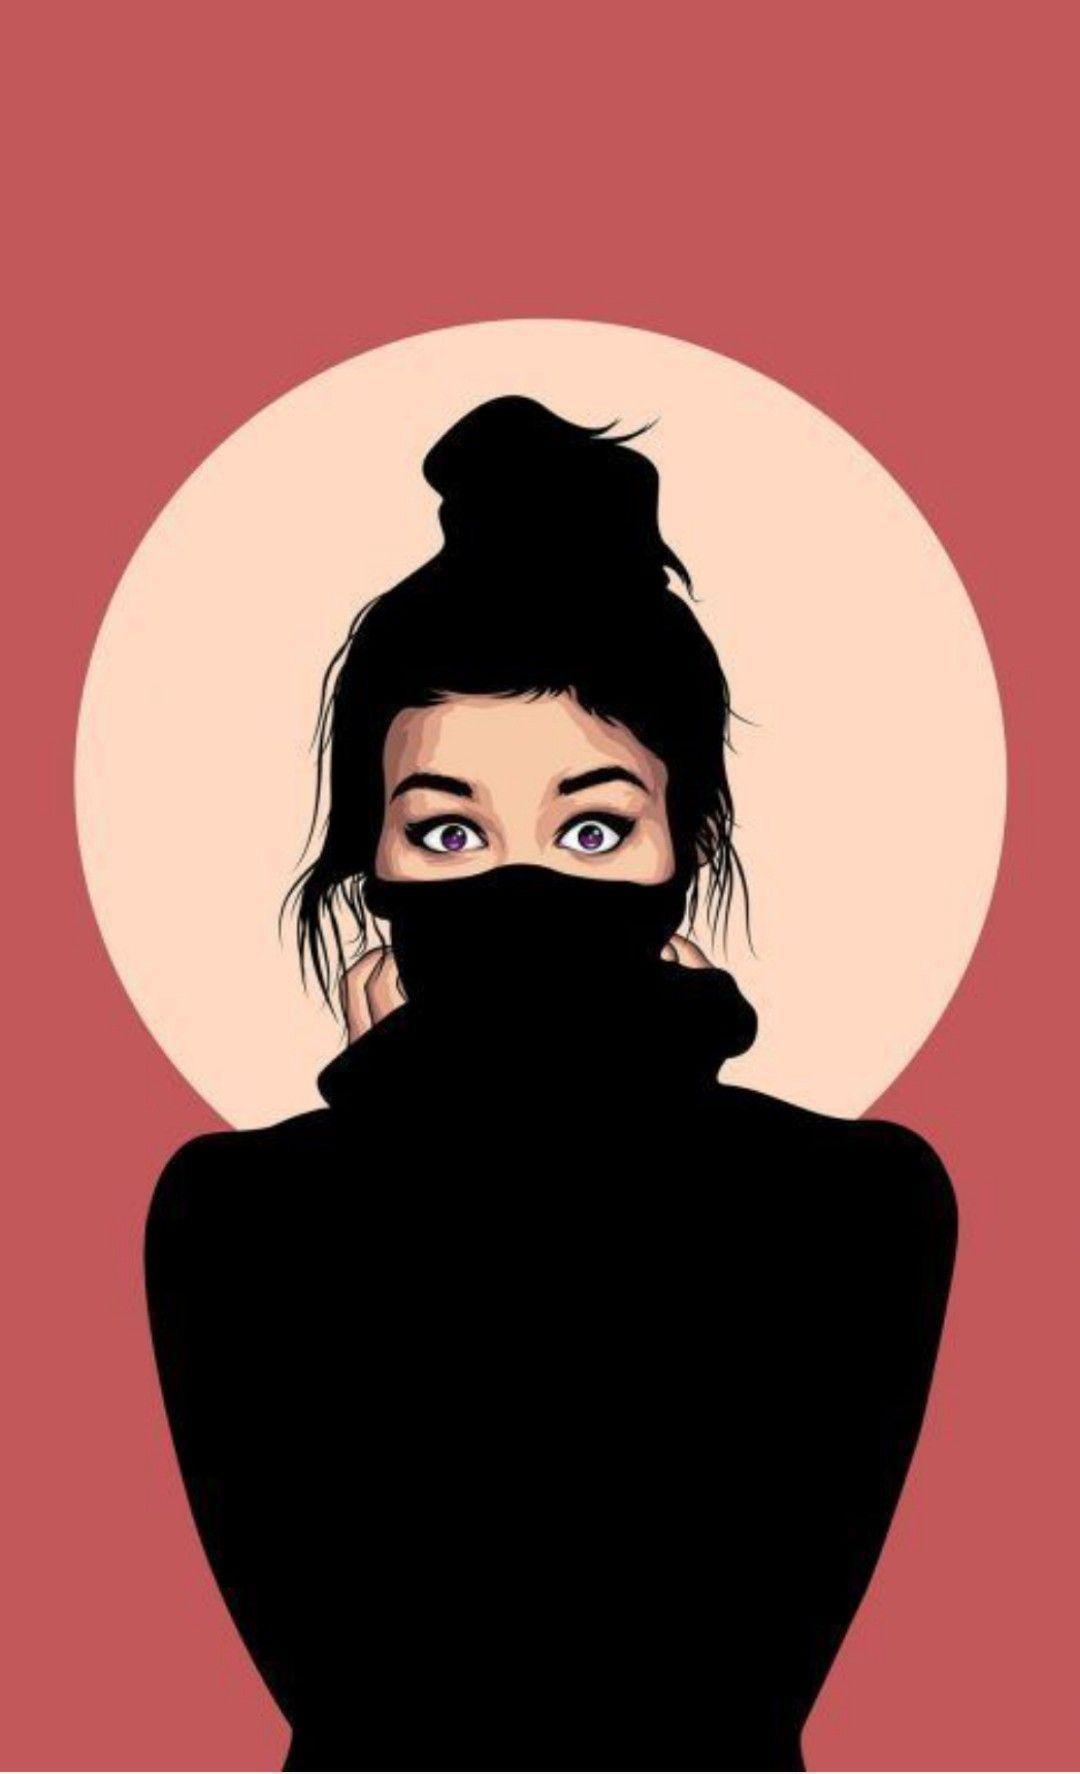 Hd Girly Wallpaper Cute Wallpaper Girl Iphone Wallpaper Girly Hipster Phone Wallpaper Cute Black Wallpaper